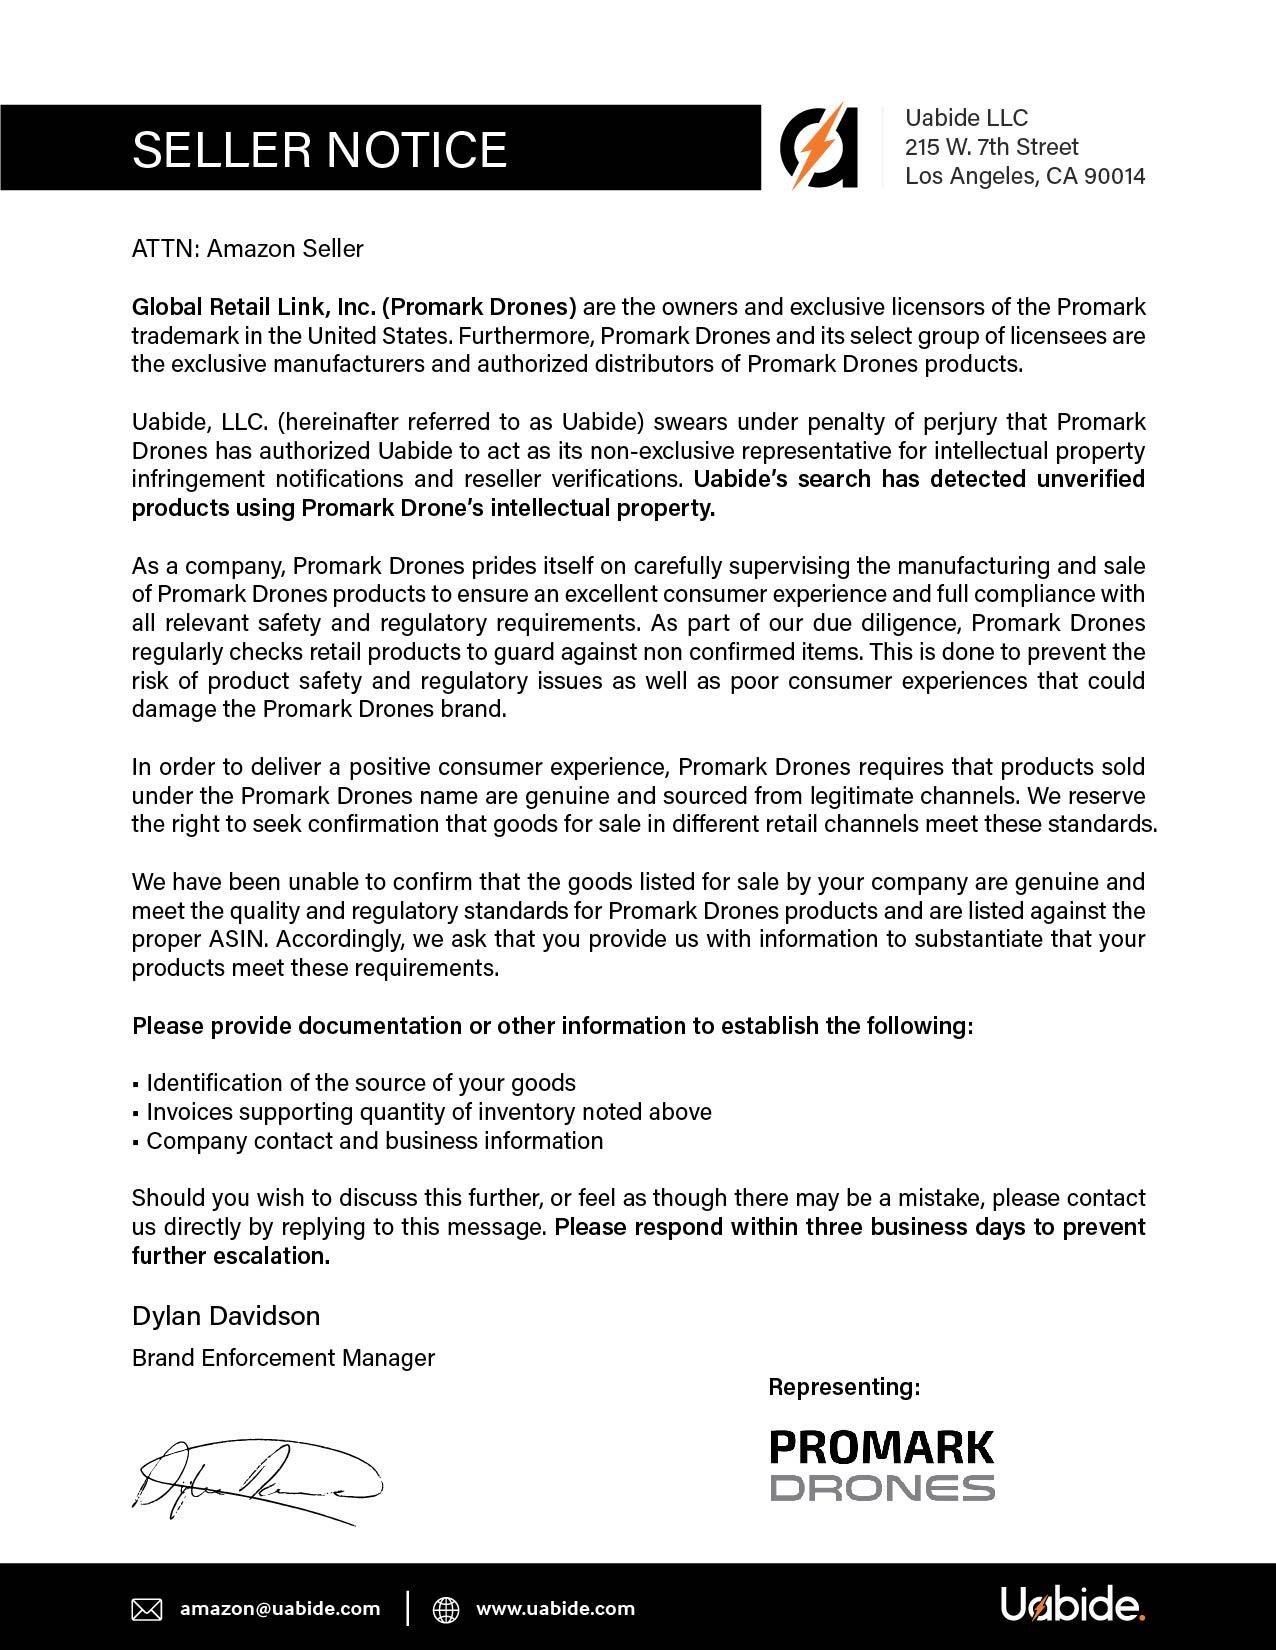 Promark Drones - Seller Notice (Uabide)-01.jpg